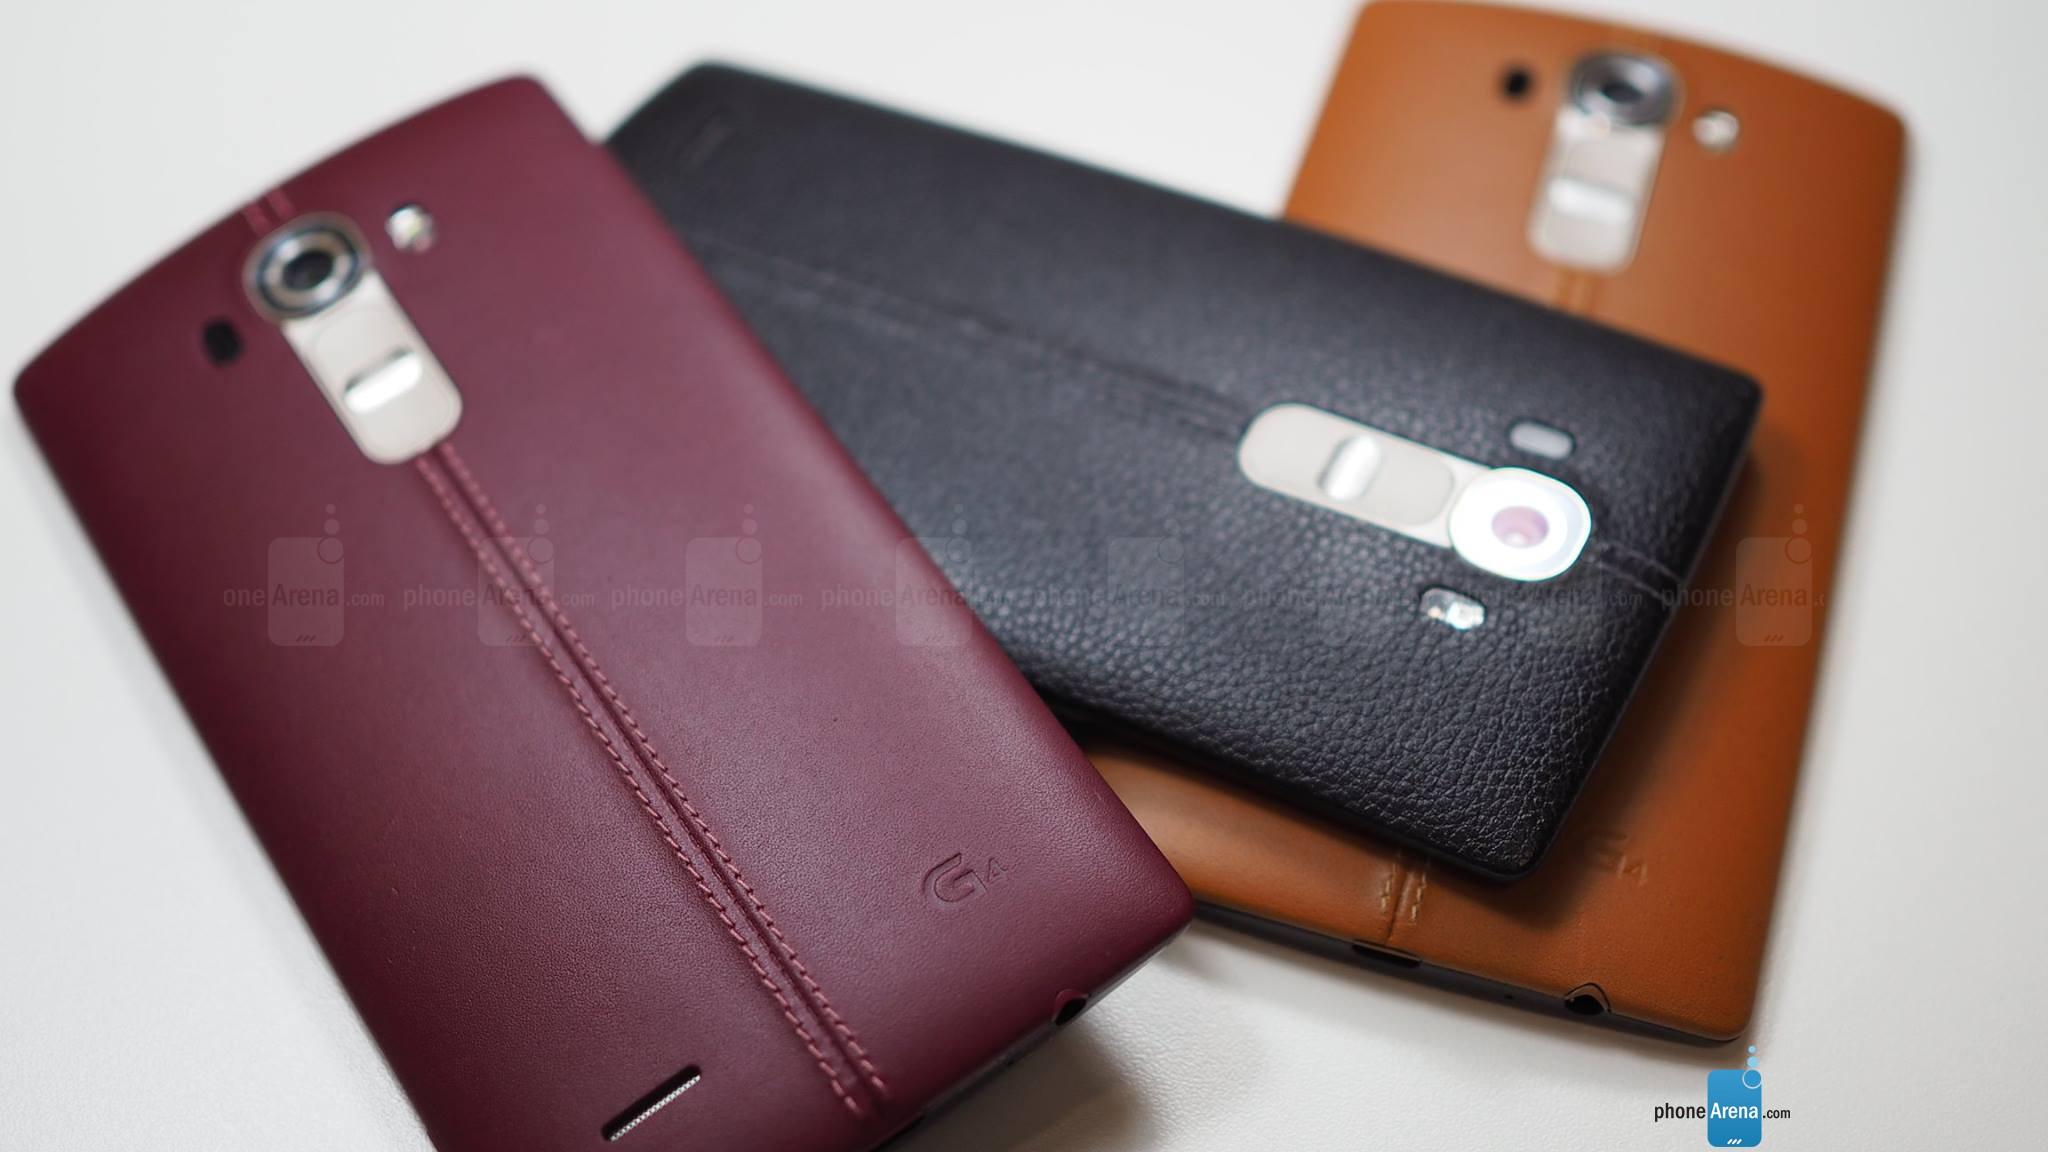 LG G4 images1